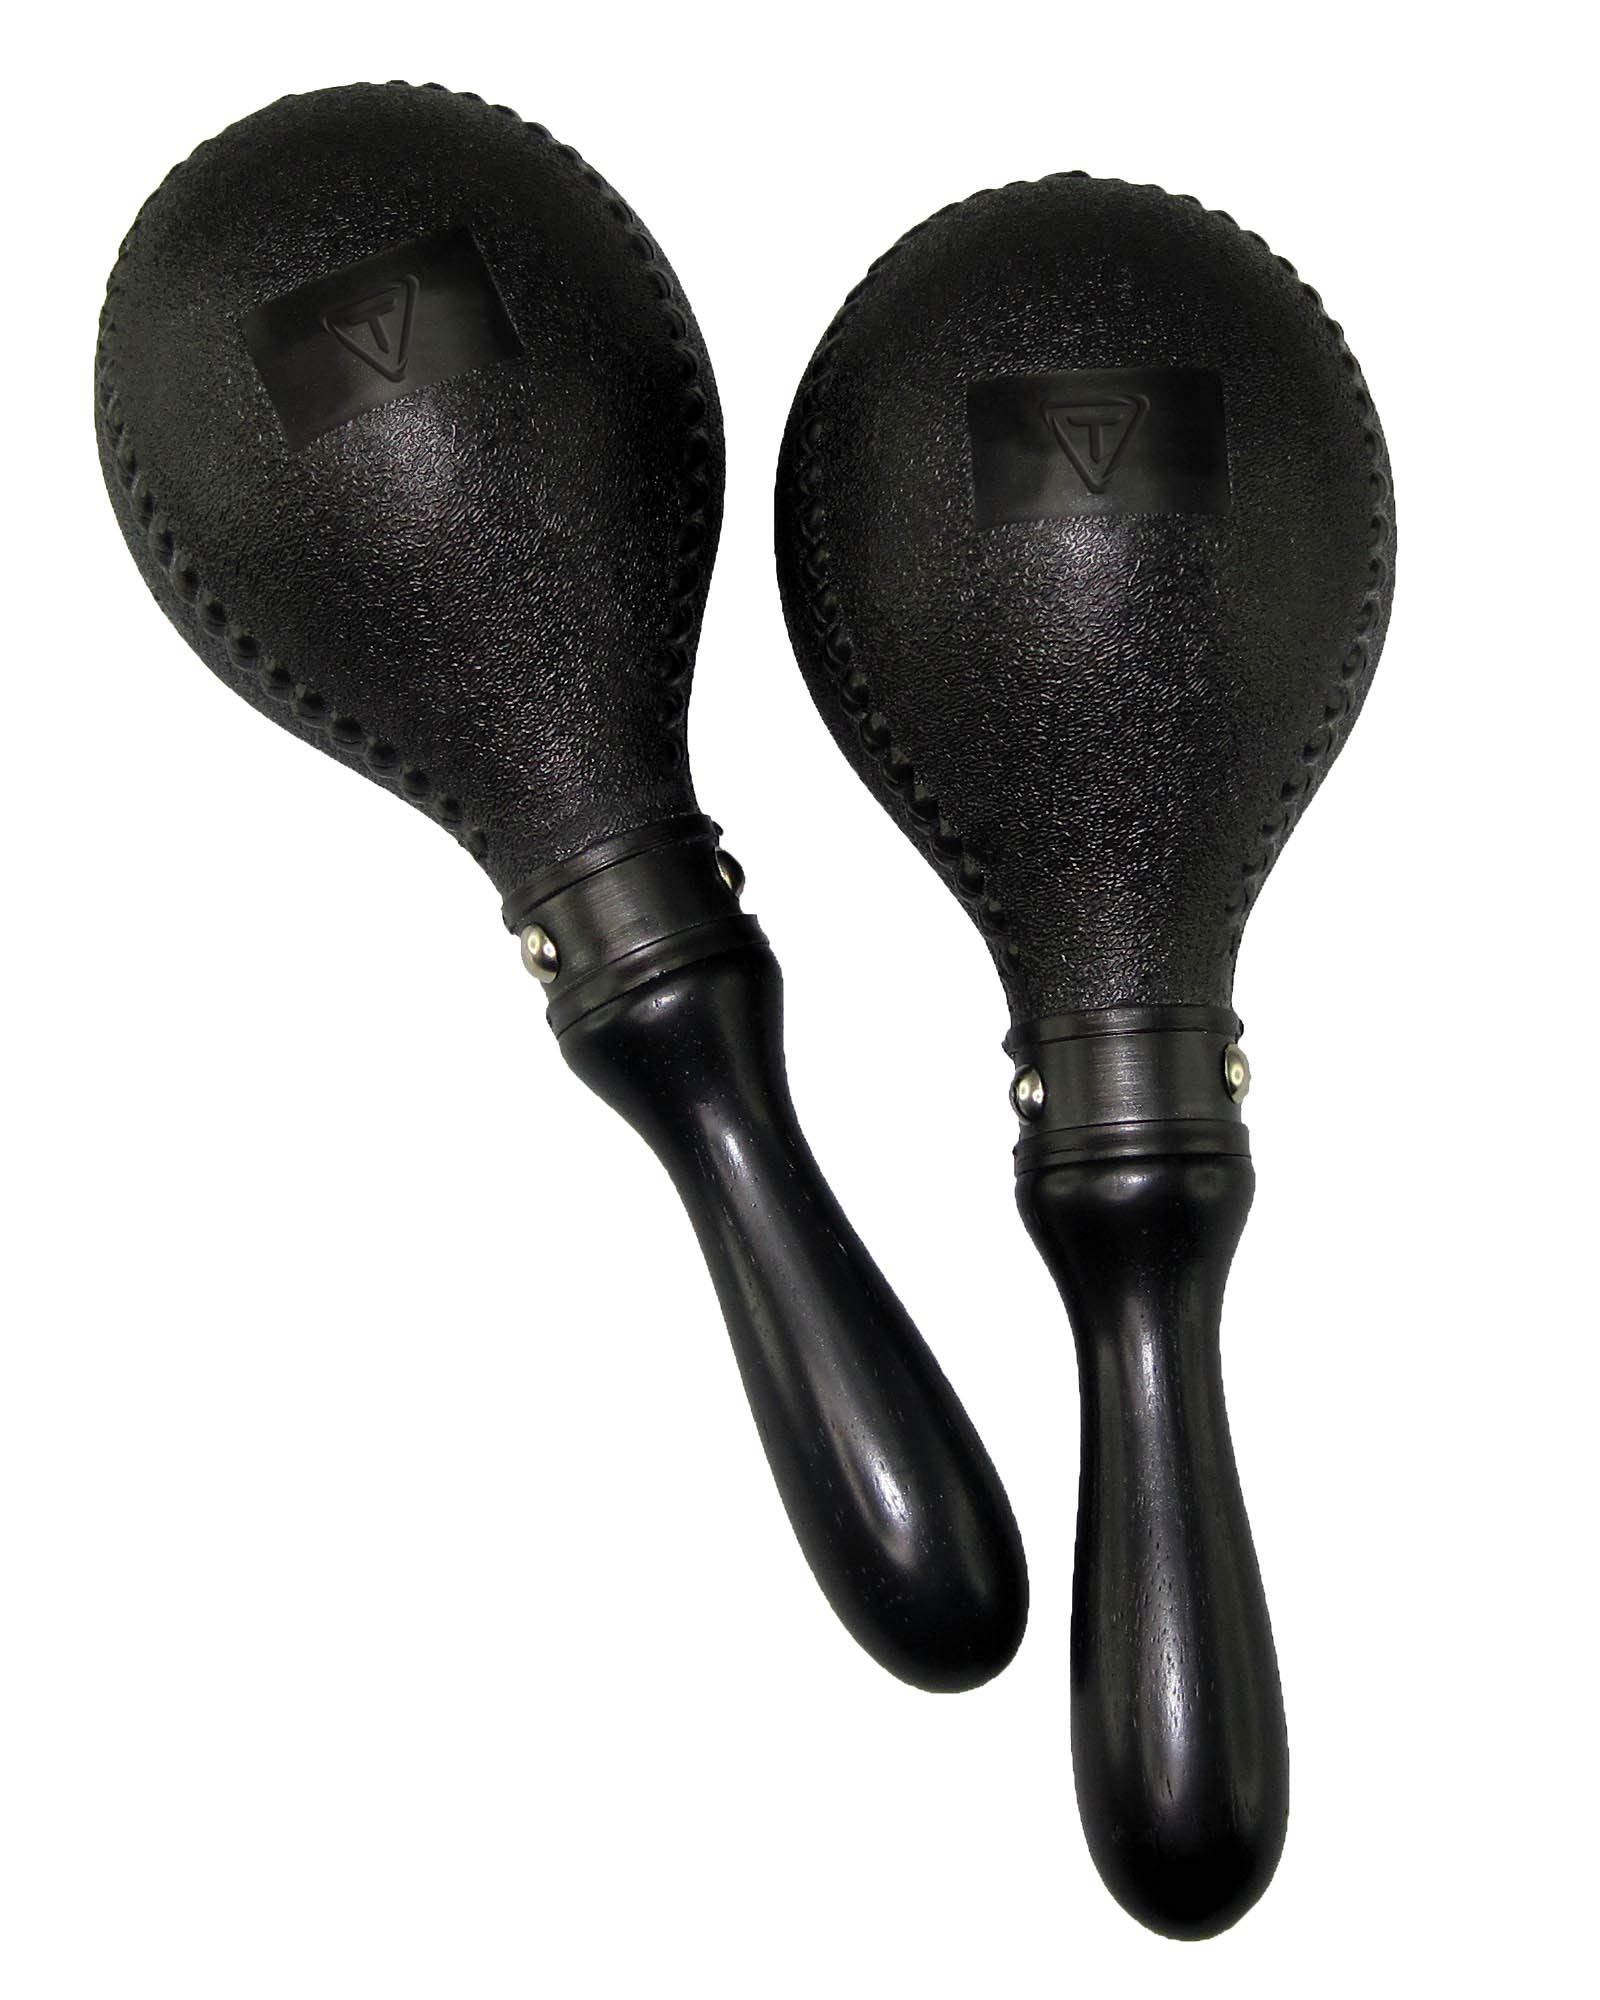 Tycoon Percussion TMP-DB Double Black Plastic Maracas